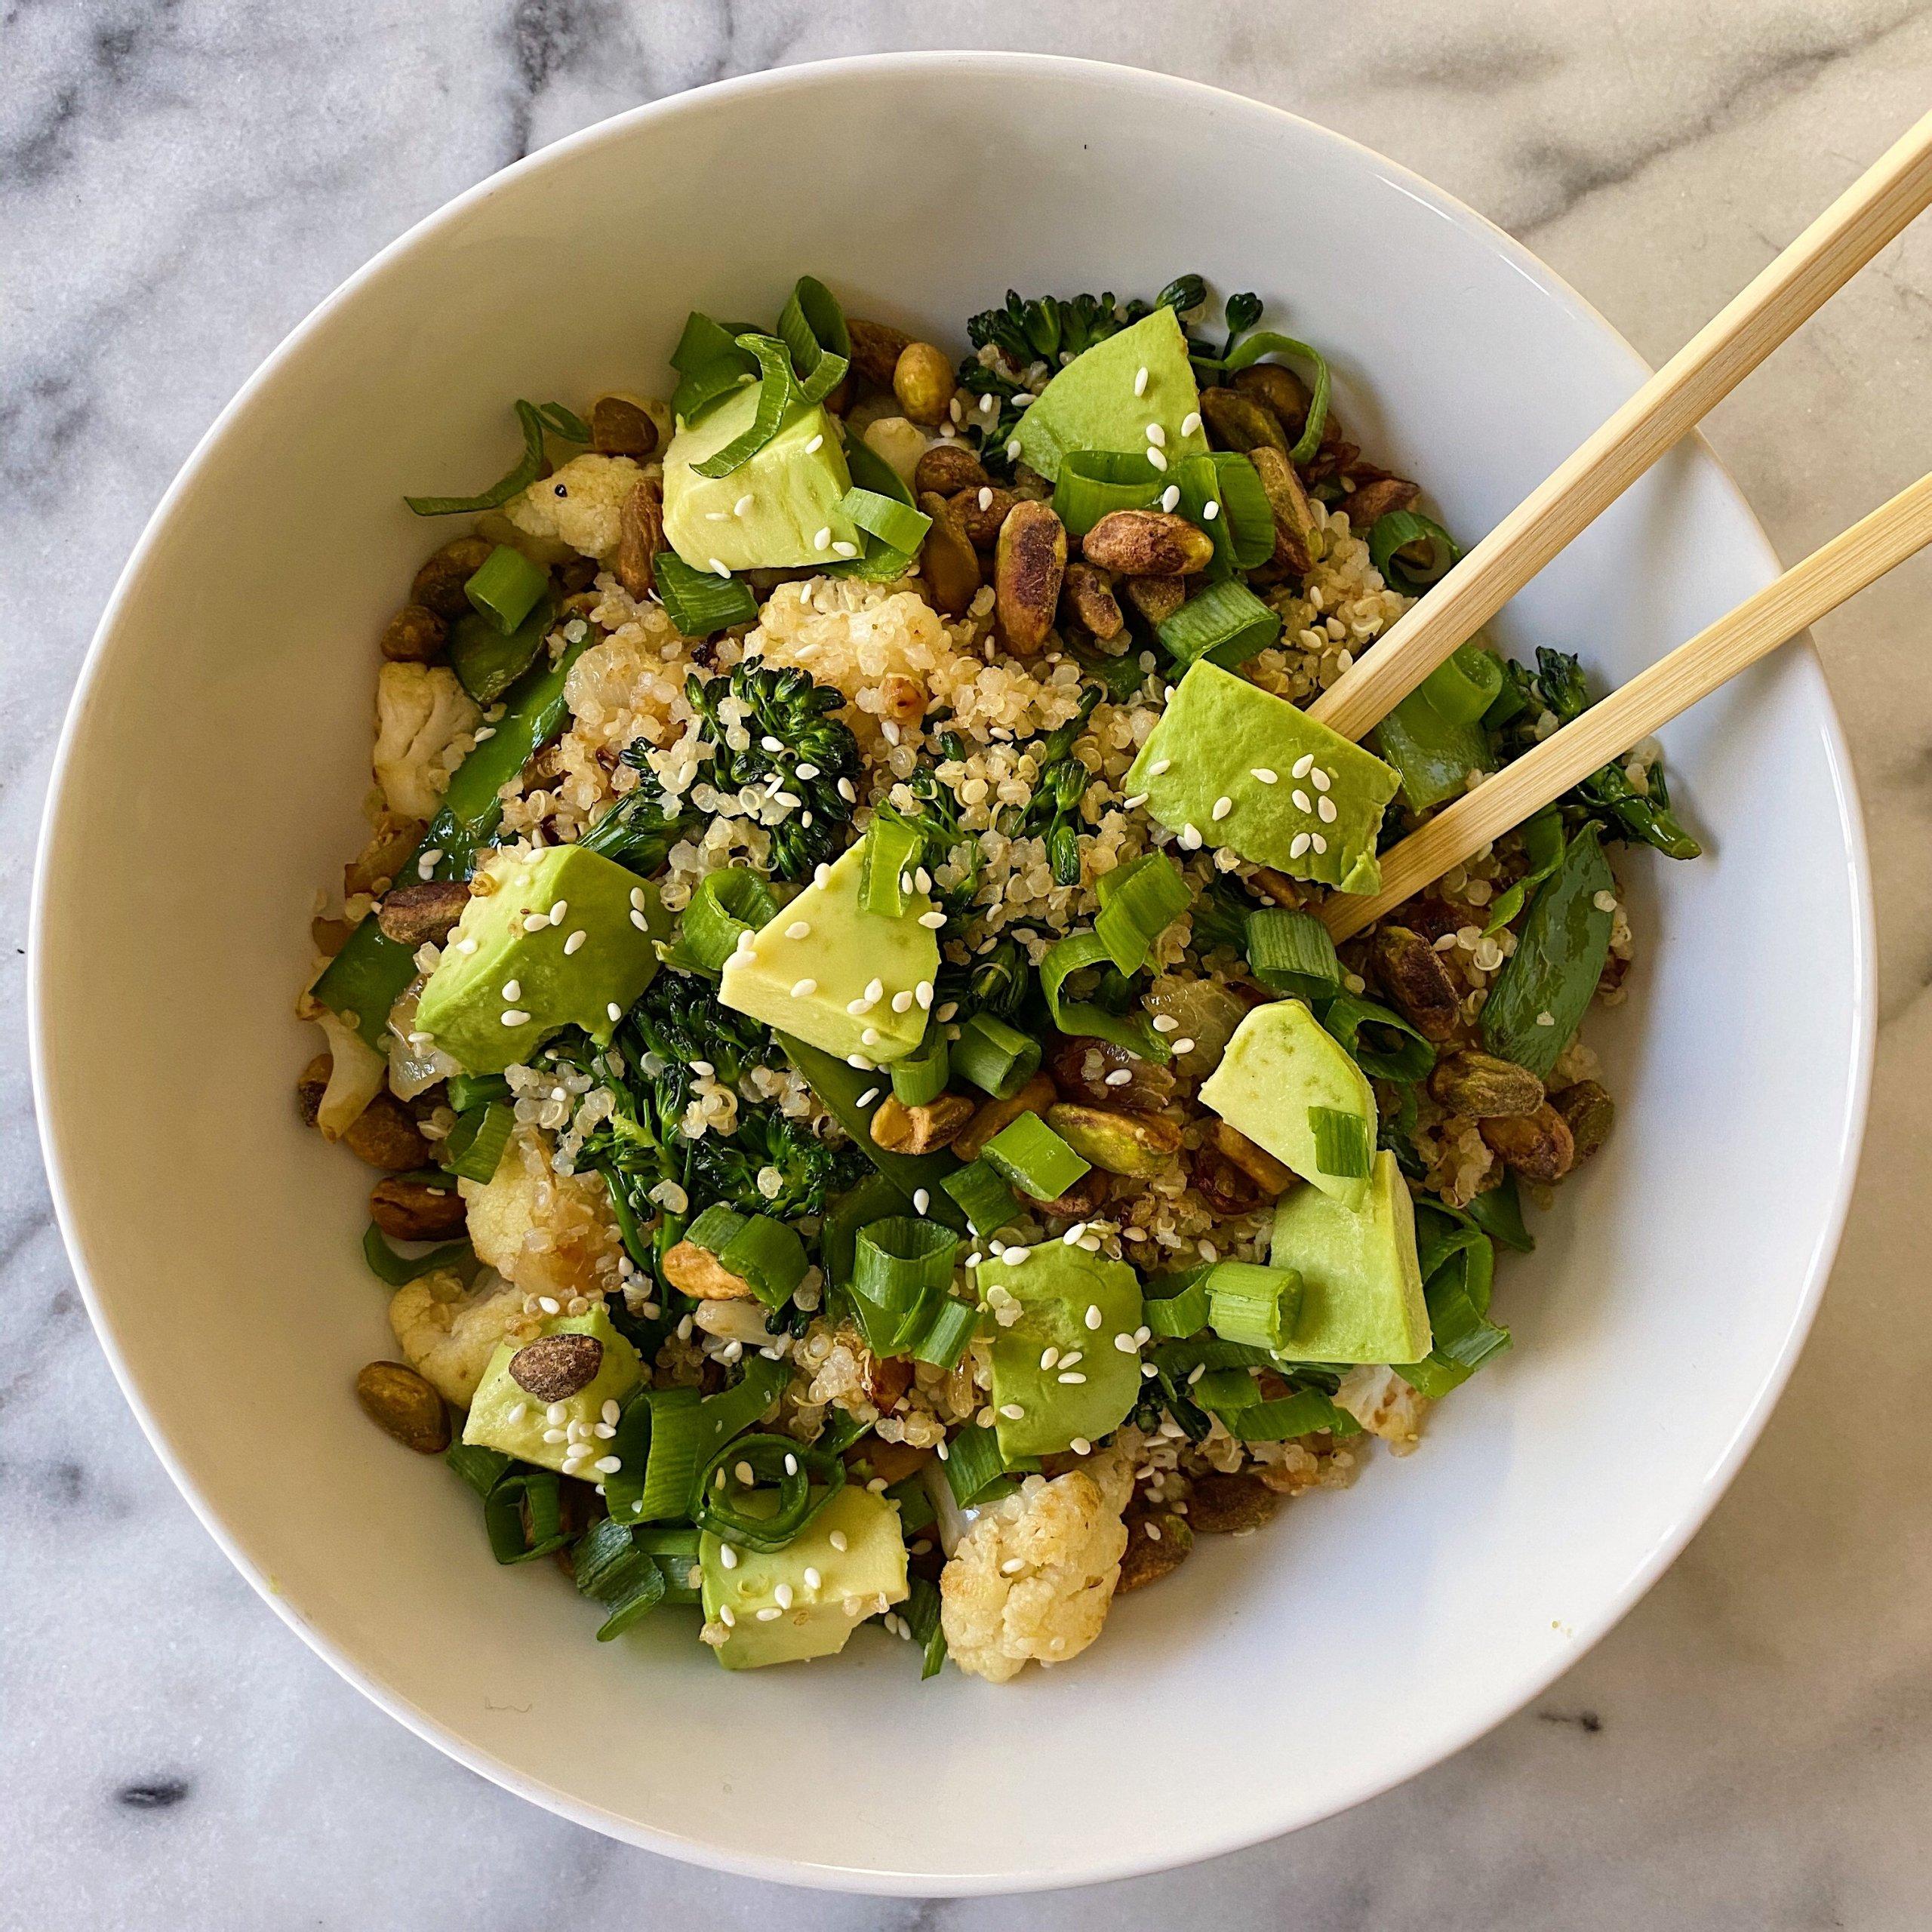 Veggie Quinoa Stir Fry gluten free #glutenfreerecipes www.healthygffamily.com